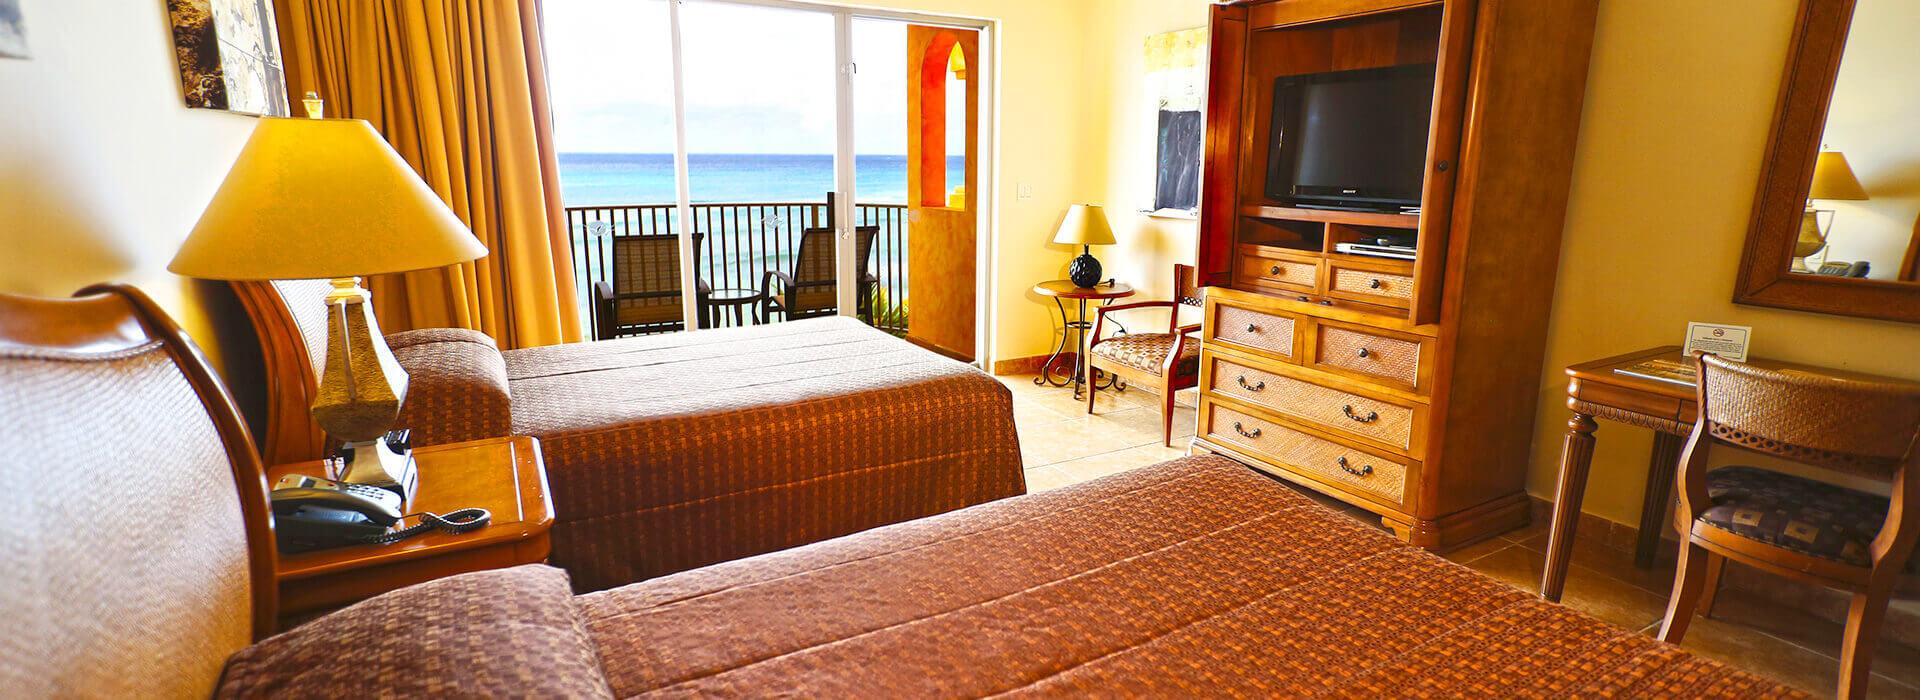 Two Bedroom Suite Beachfront The Royal Haciendas